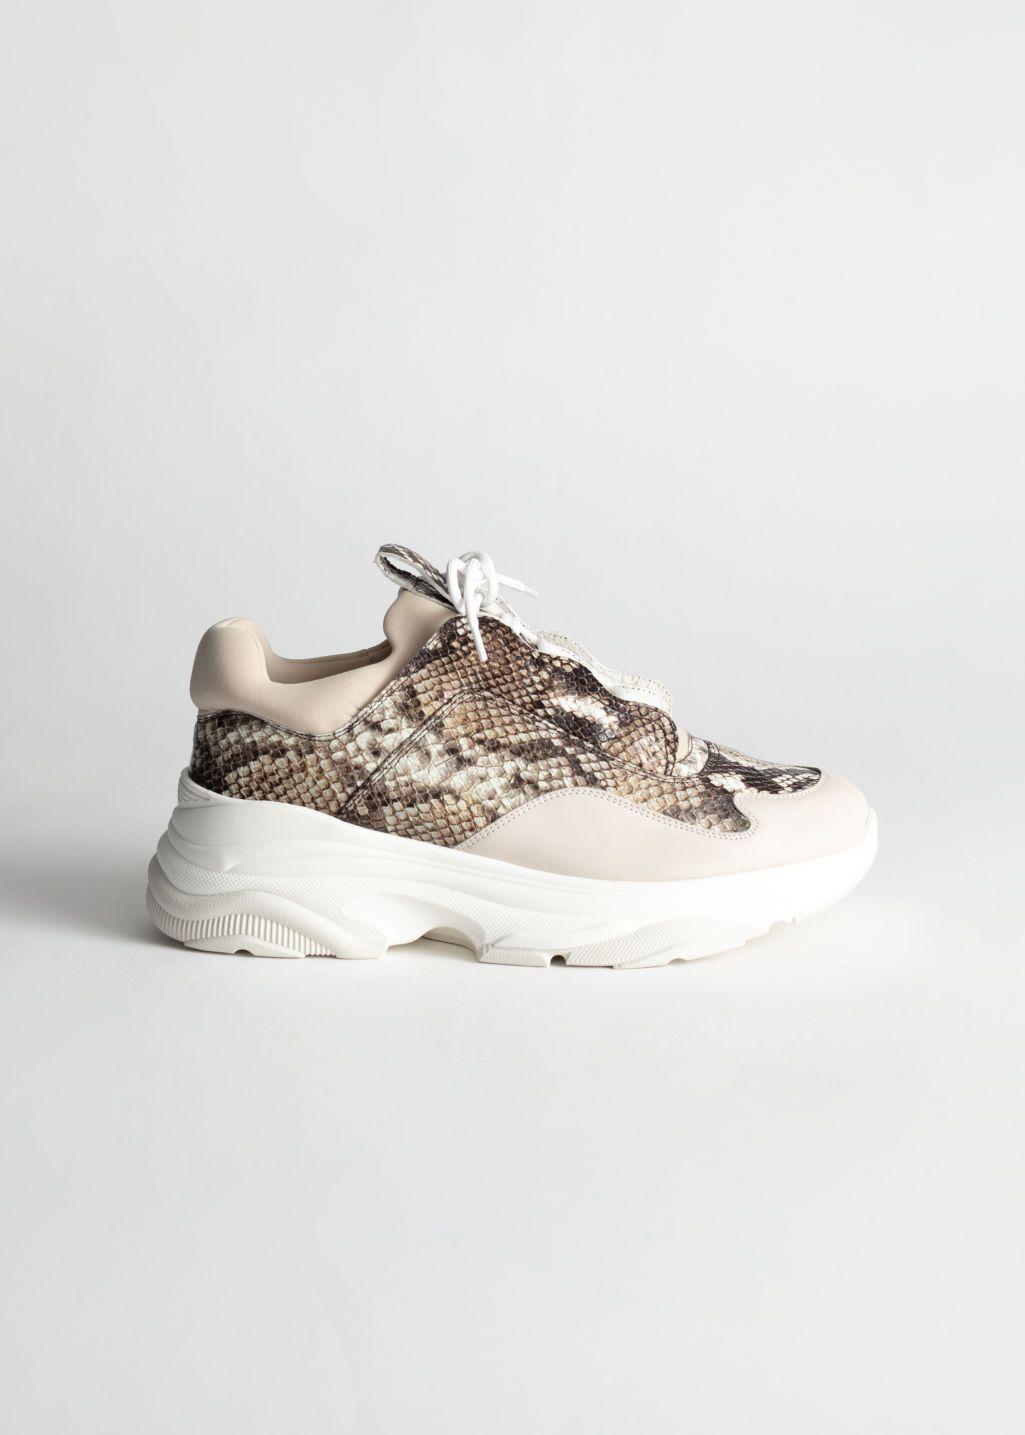 adidas Falcon | Platform sneakers, Sneakers, Snake print